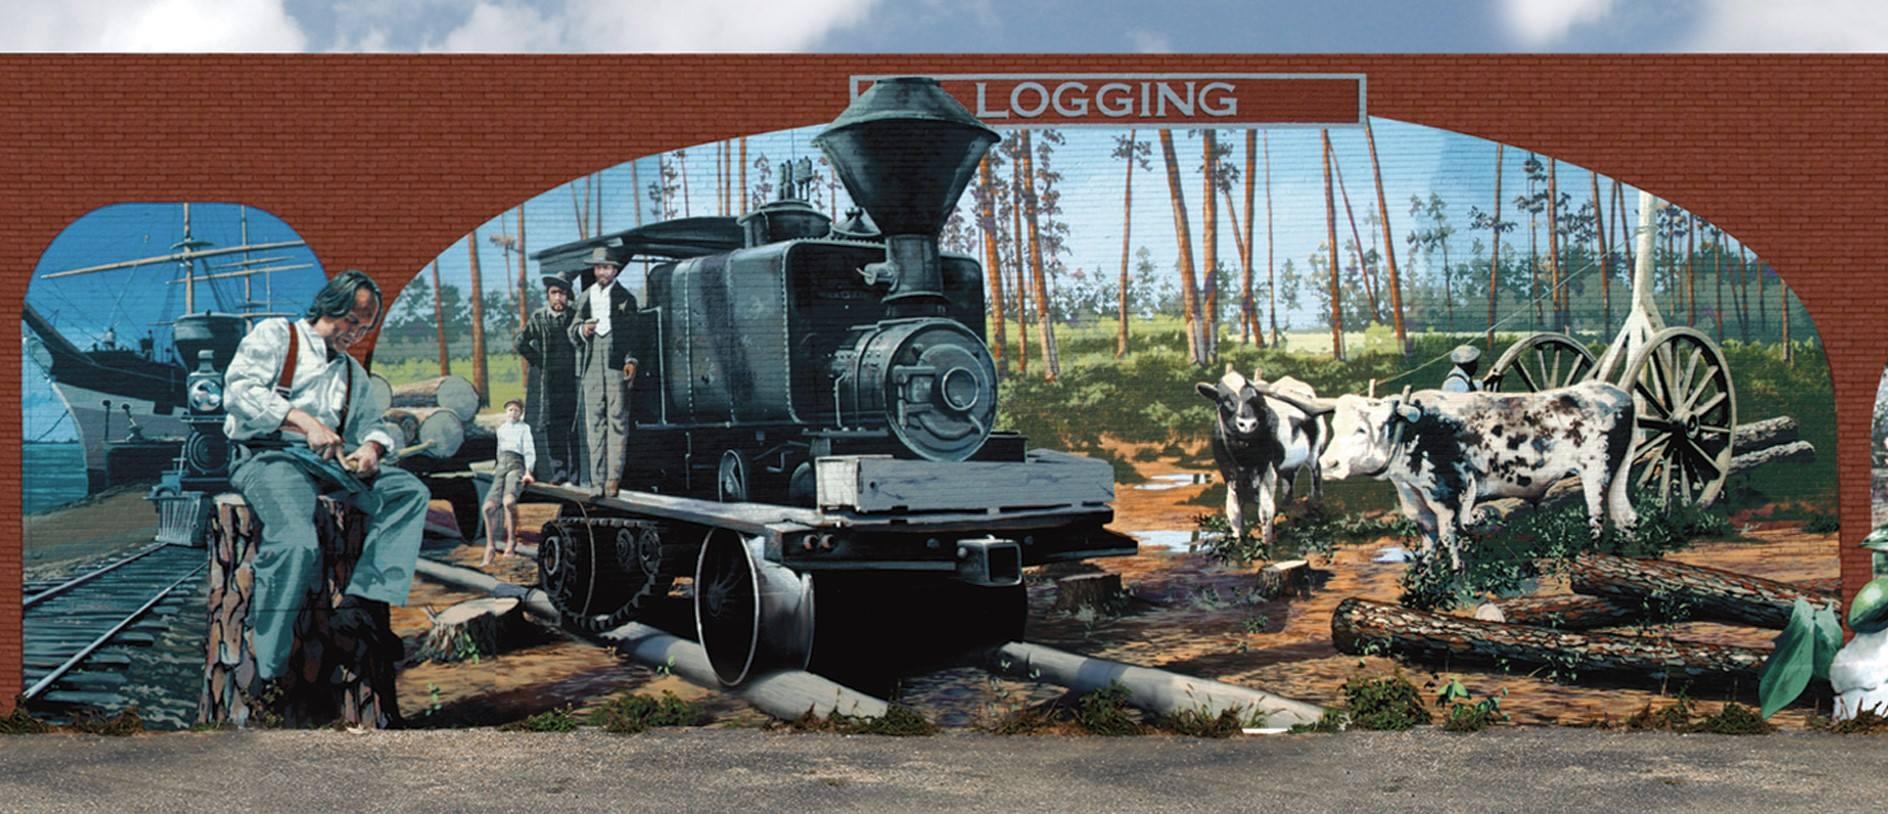 logging mural.jpg